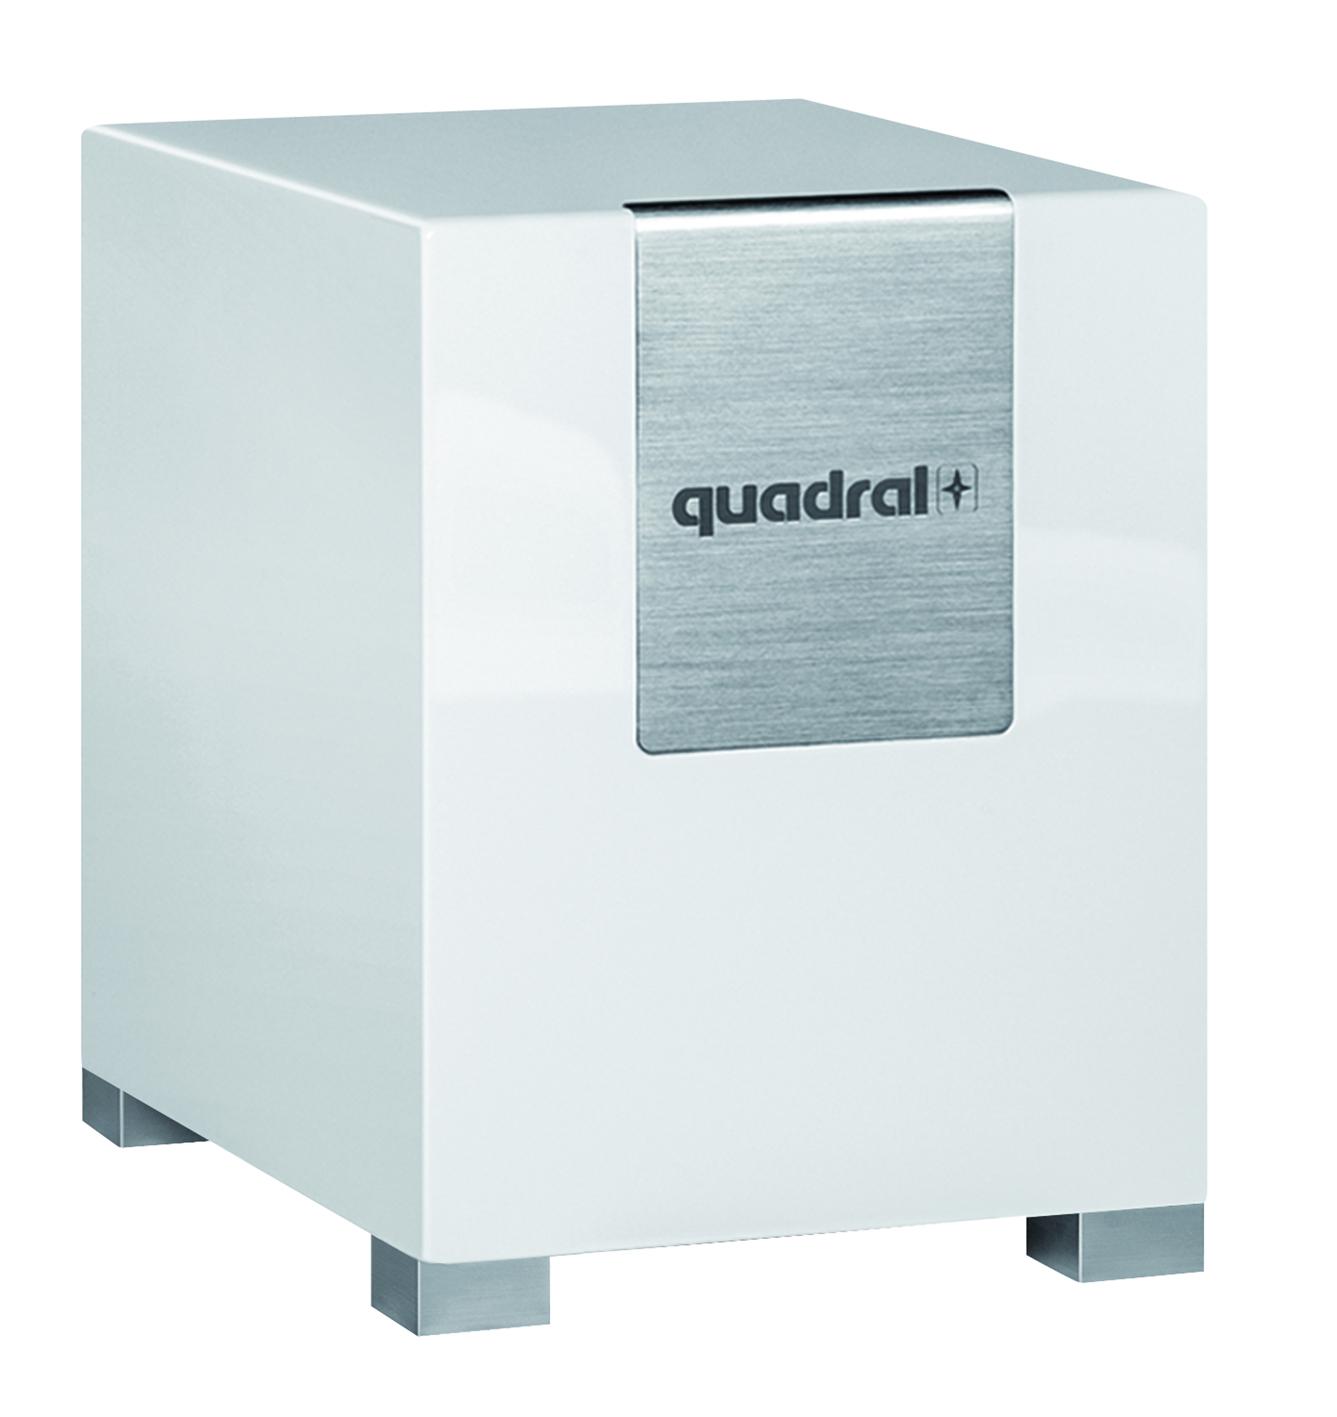 quadral qube 10 heimkino. Black Bedroom Furniture Sets. Home Design Ideas